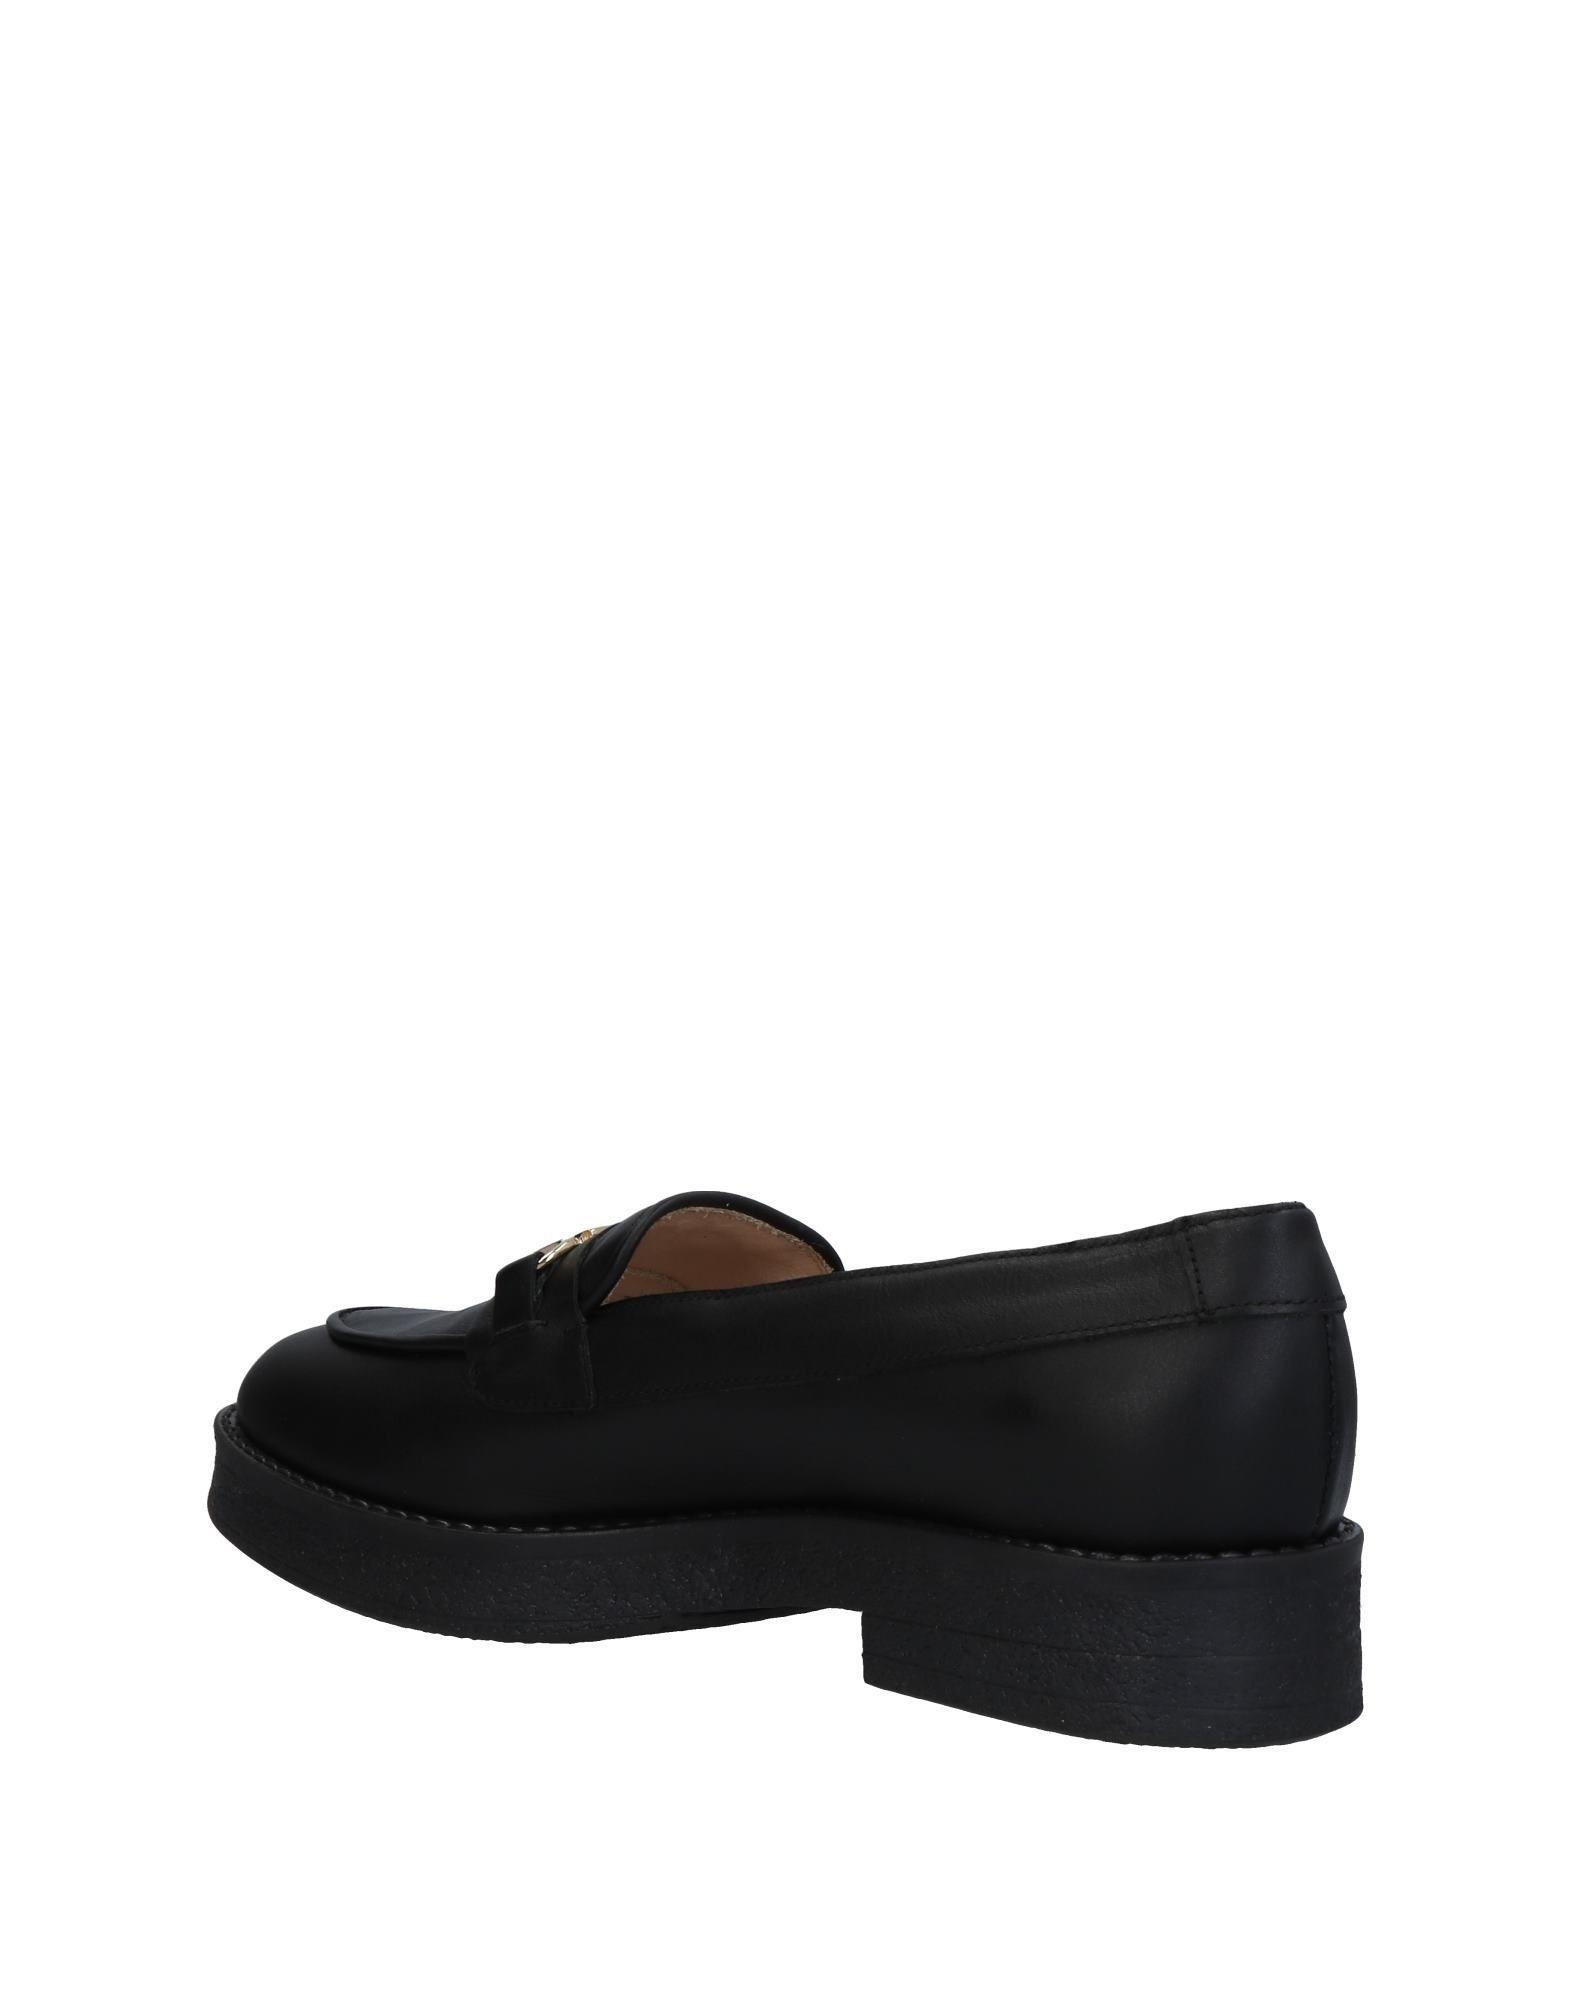 Liu Jo Black Leather Loafers